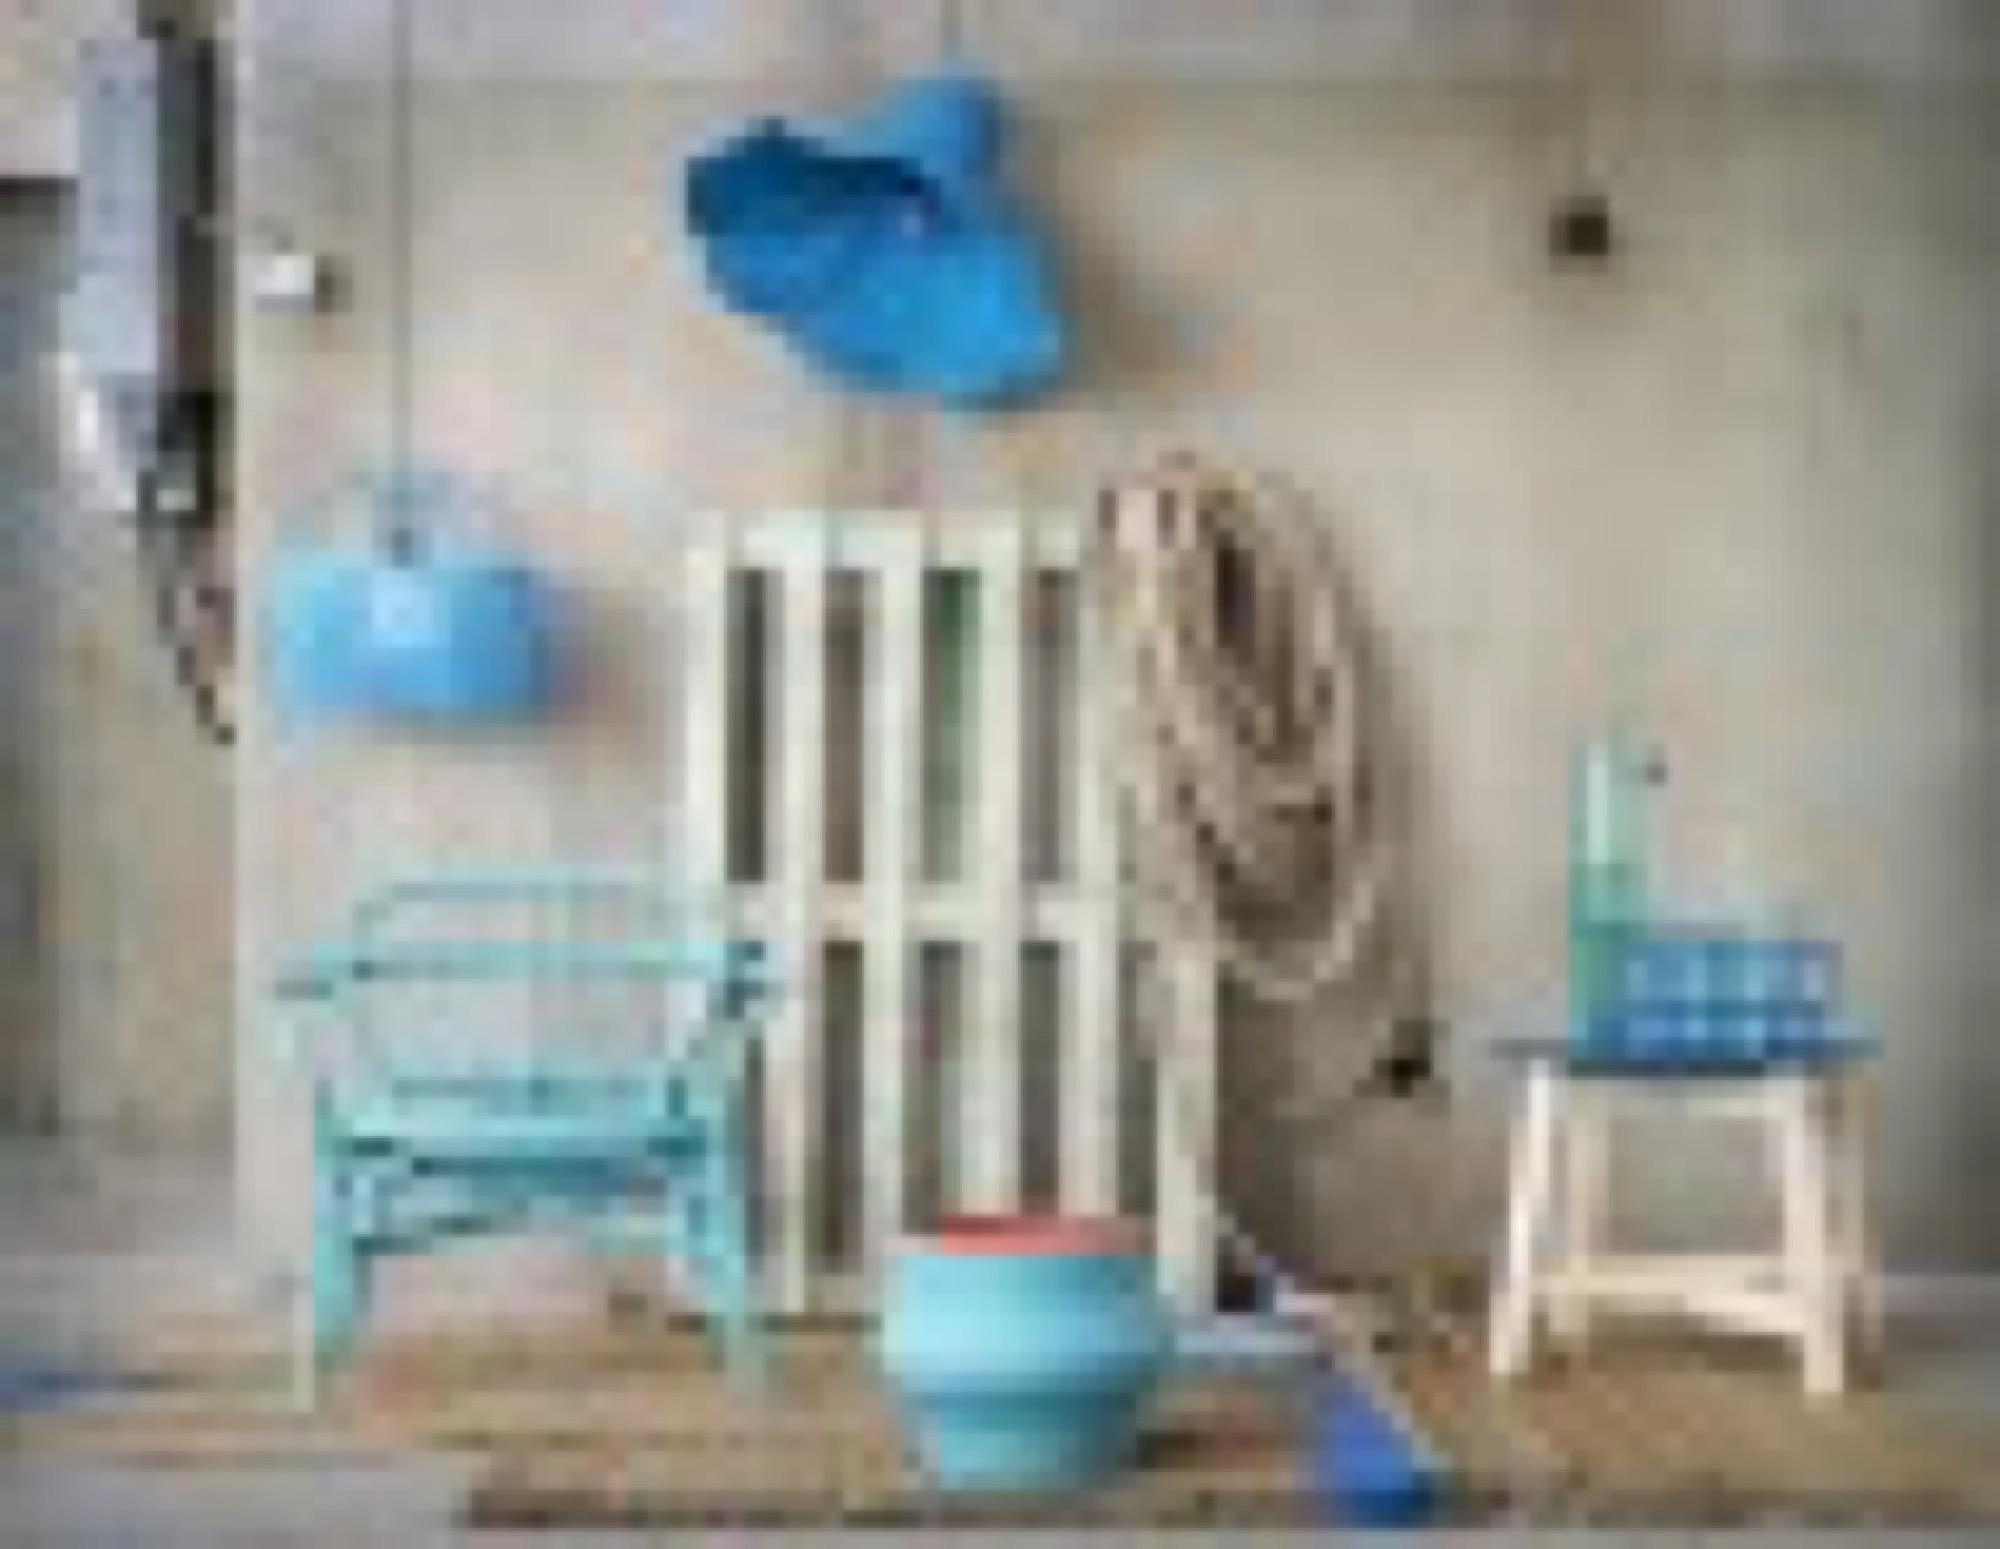 IKEA/Livet hemma